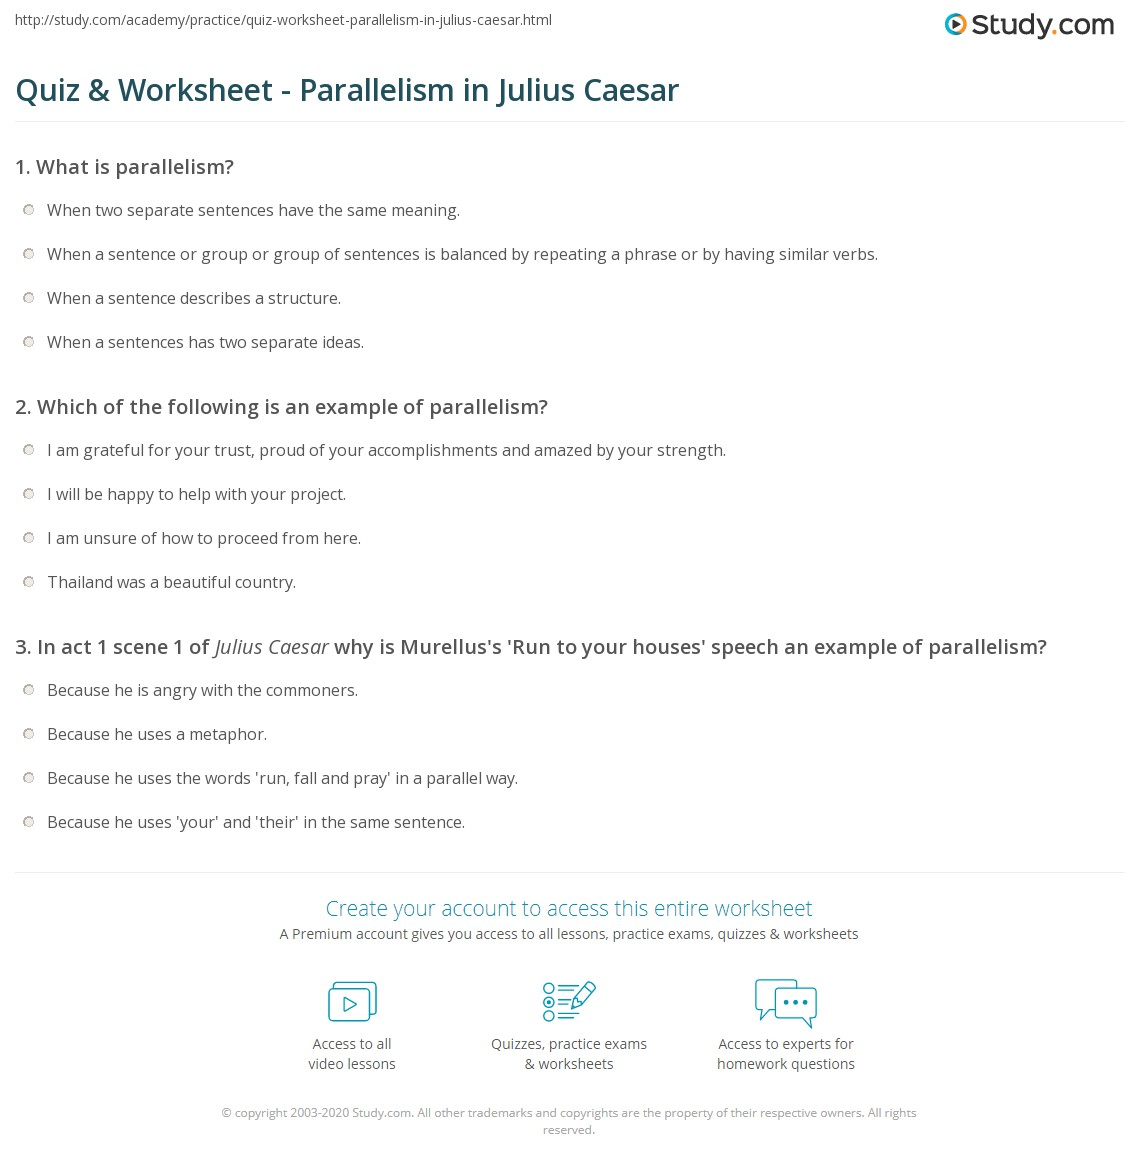 Parallelism Worksheet High School parallelism worksheets high – Parallelism Worksheet